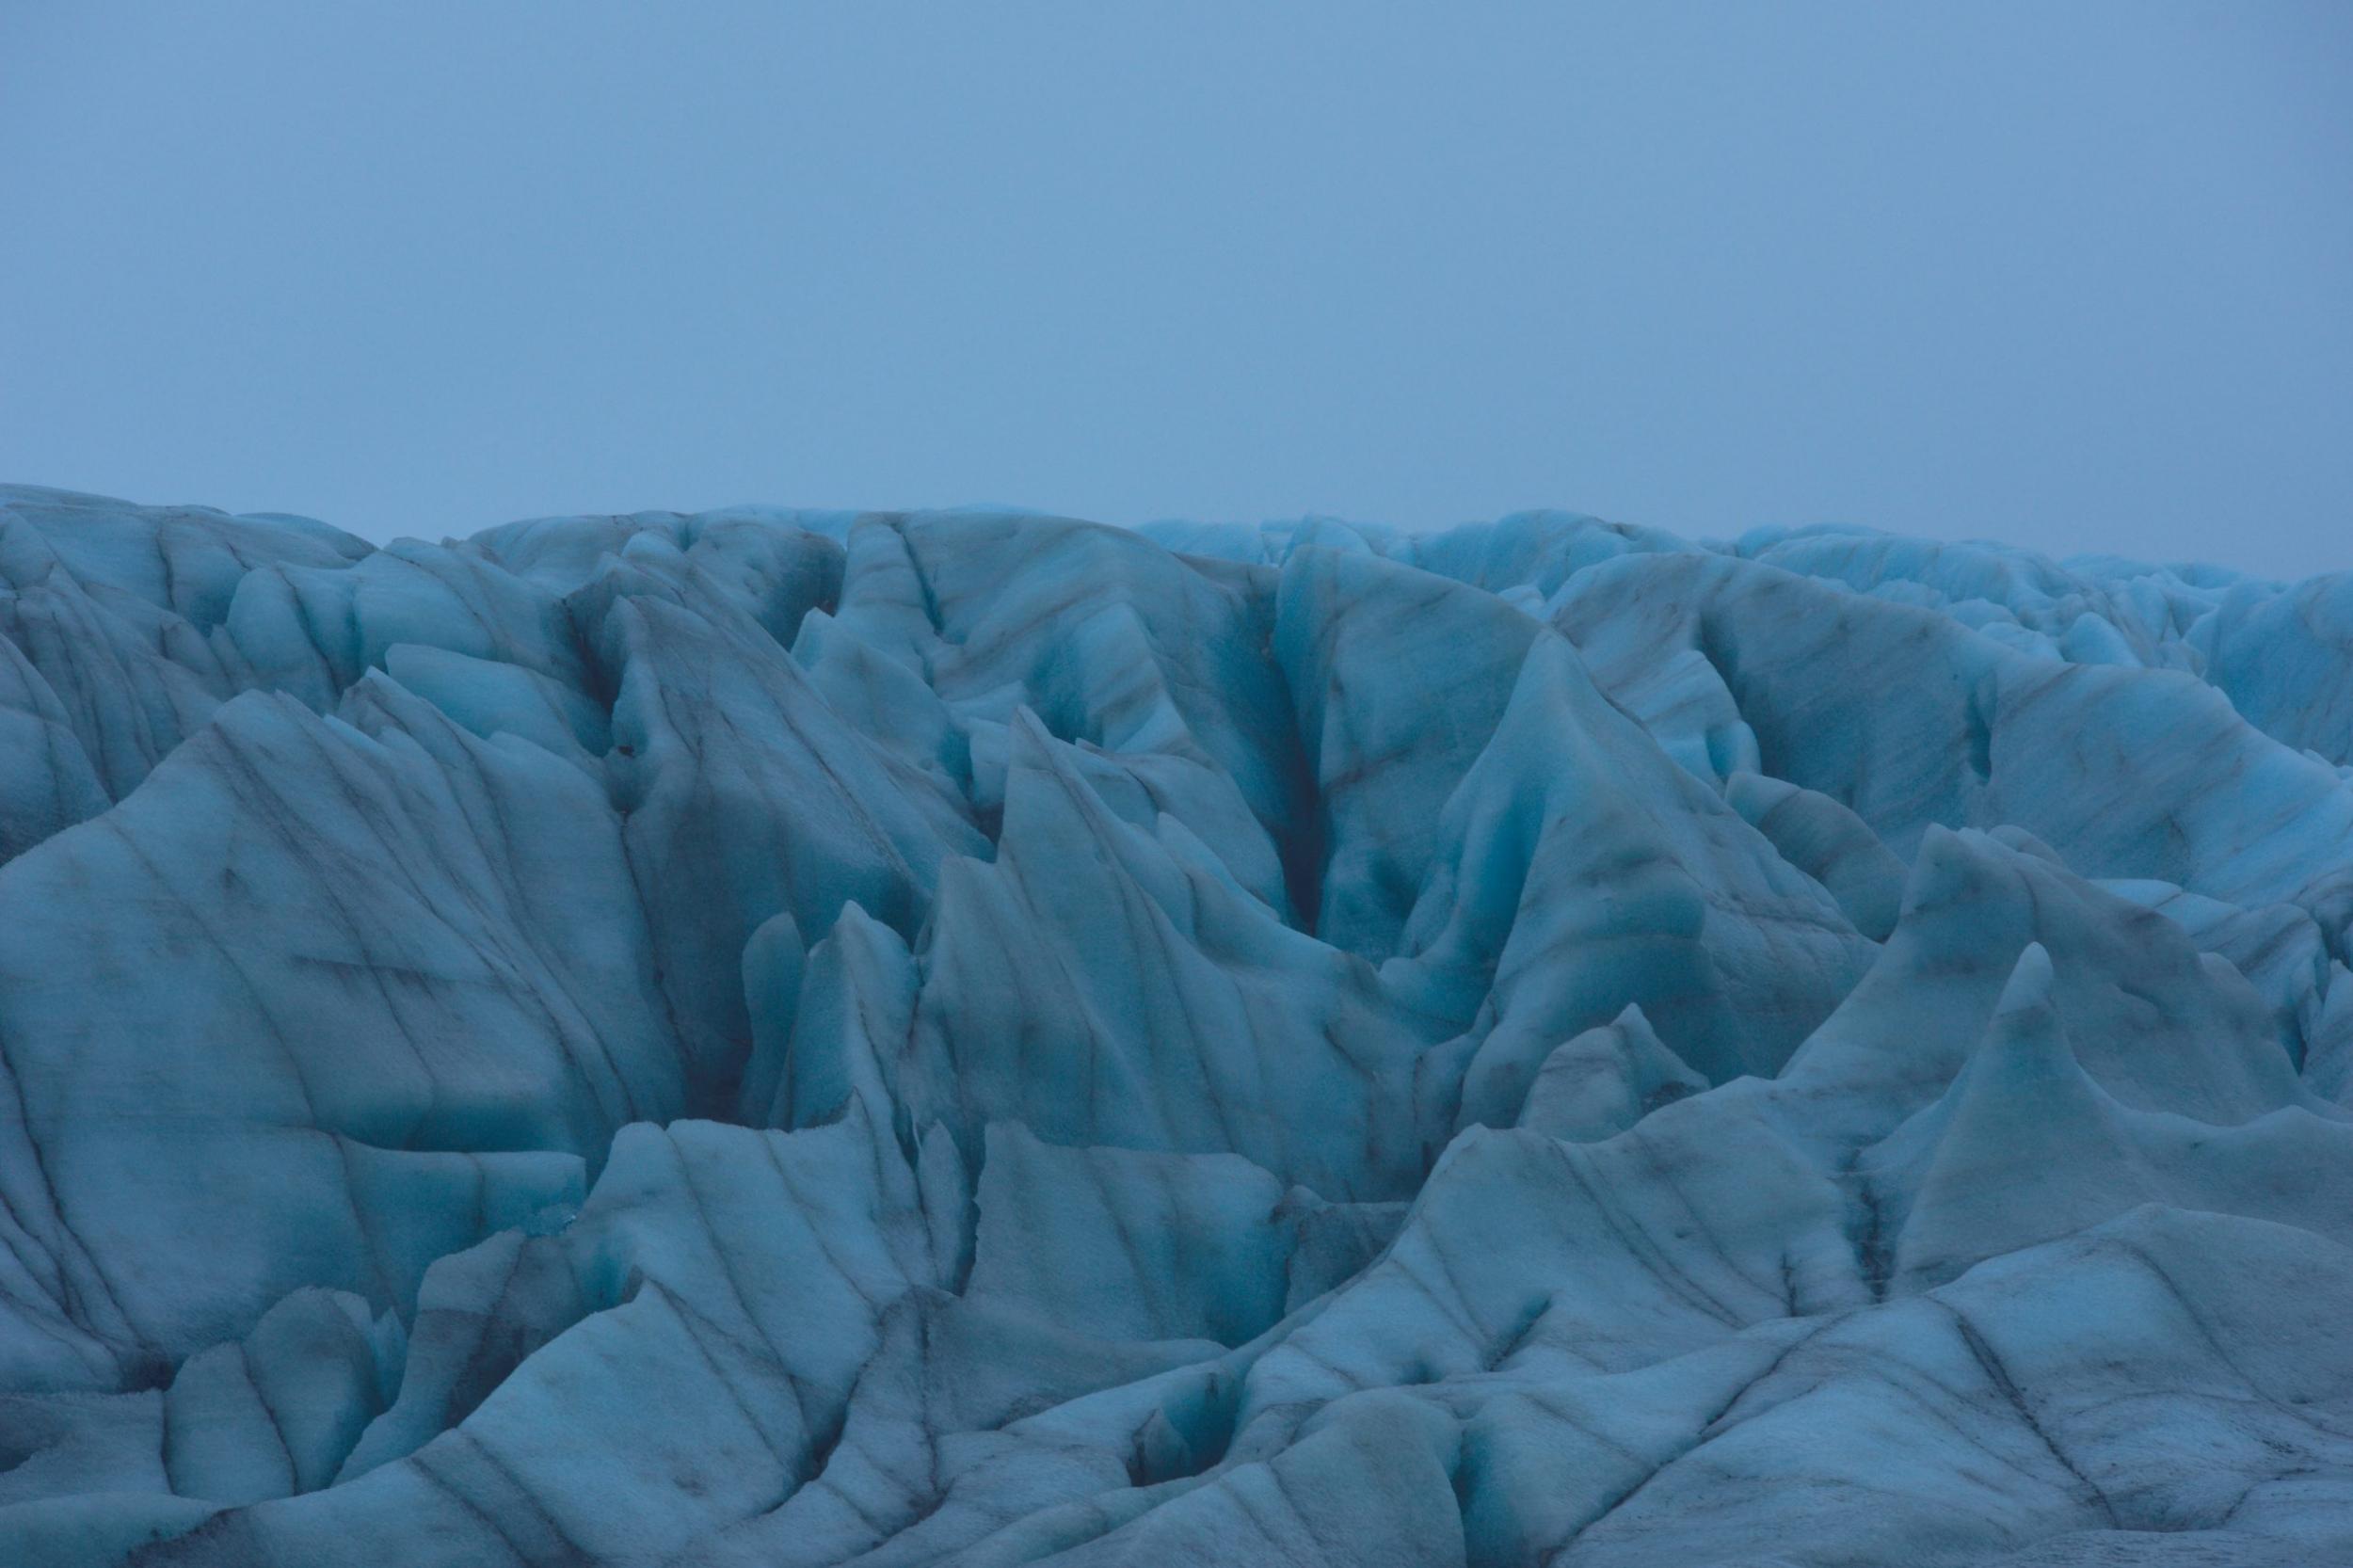 Jölülsarlon Gletscher